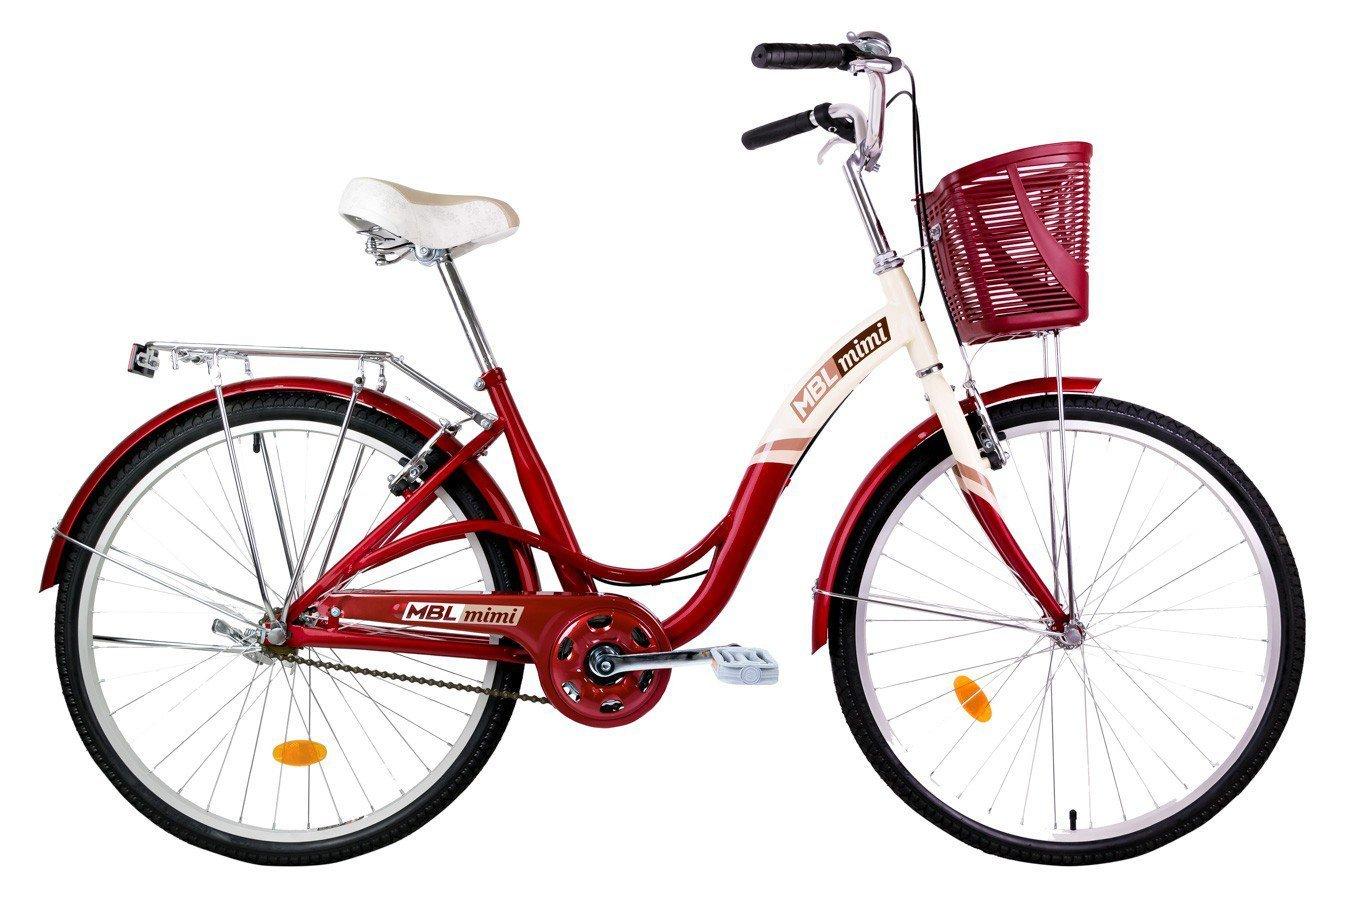 Bicicleta Urbana Mobele Mimi & Bibi Aro 26 com Cestinha